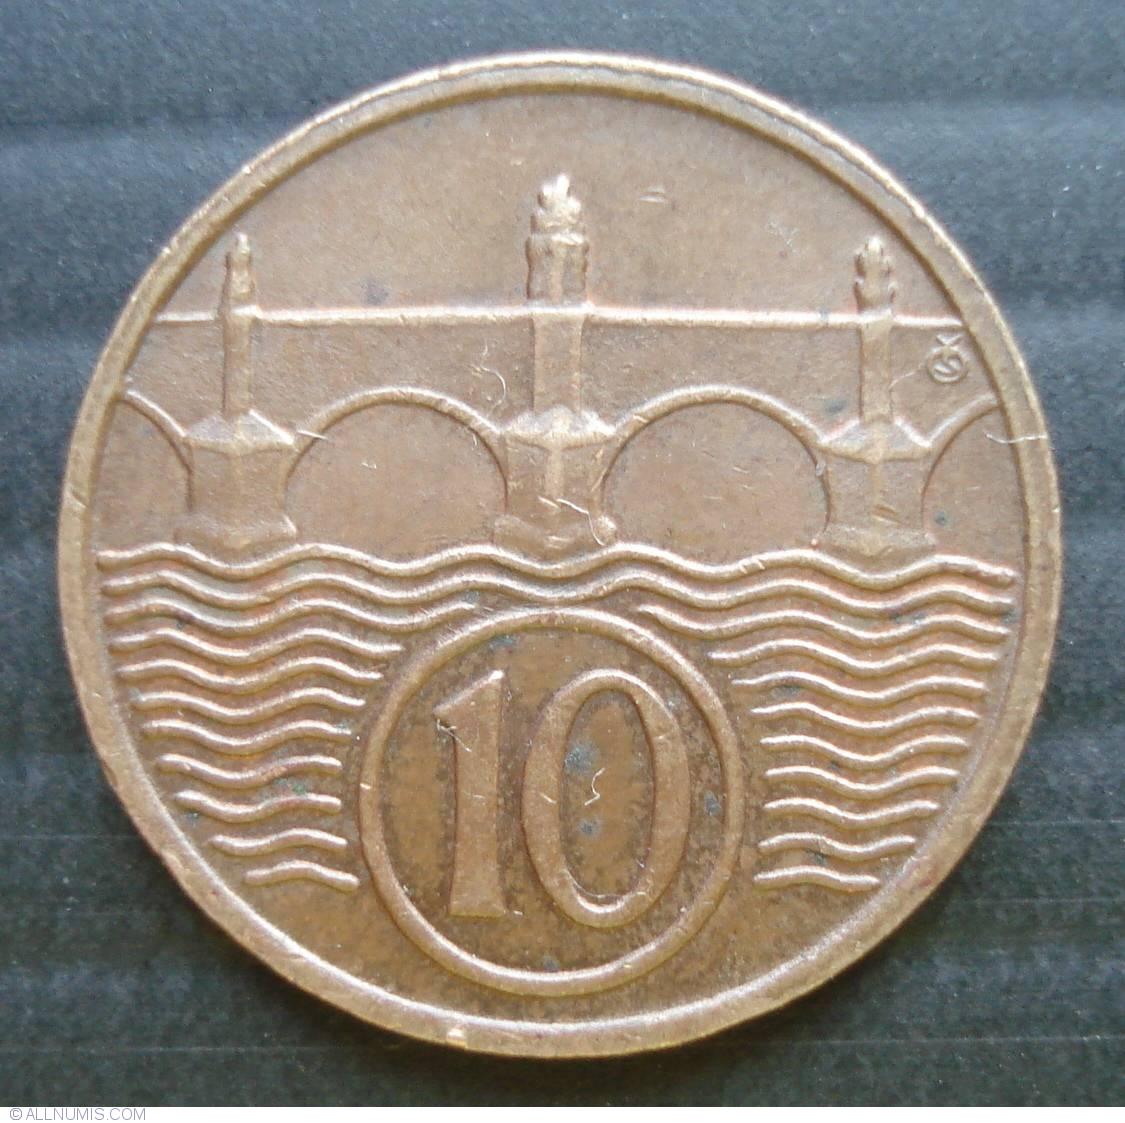 20 HALERU 1937 *LOT 10F19* WORLD FOREIGN COINS CZECHOSLOVAKIA